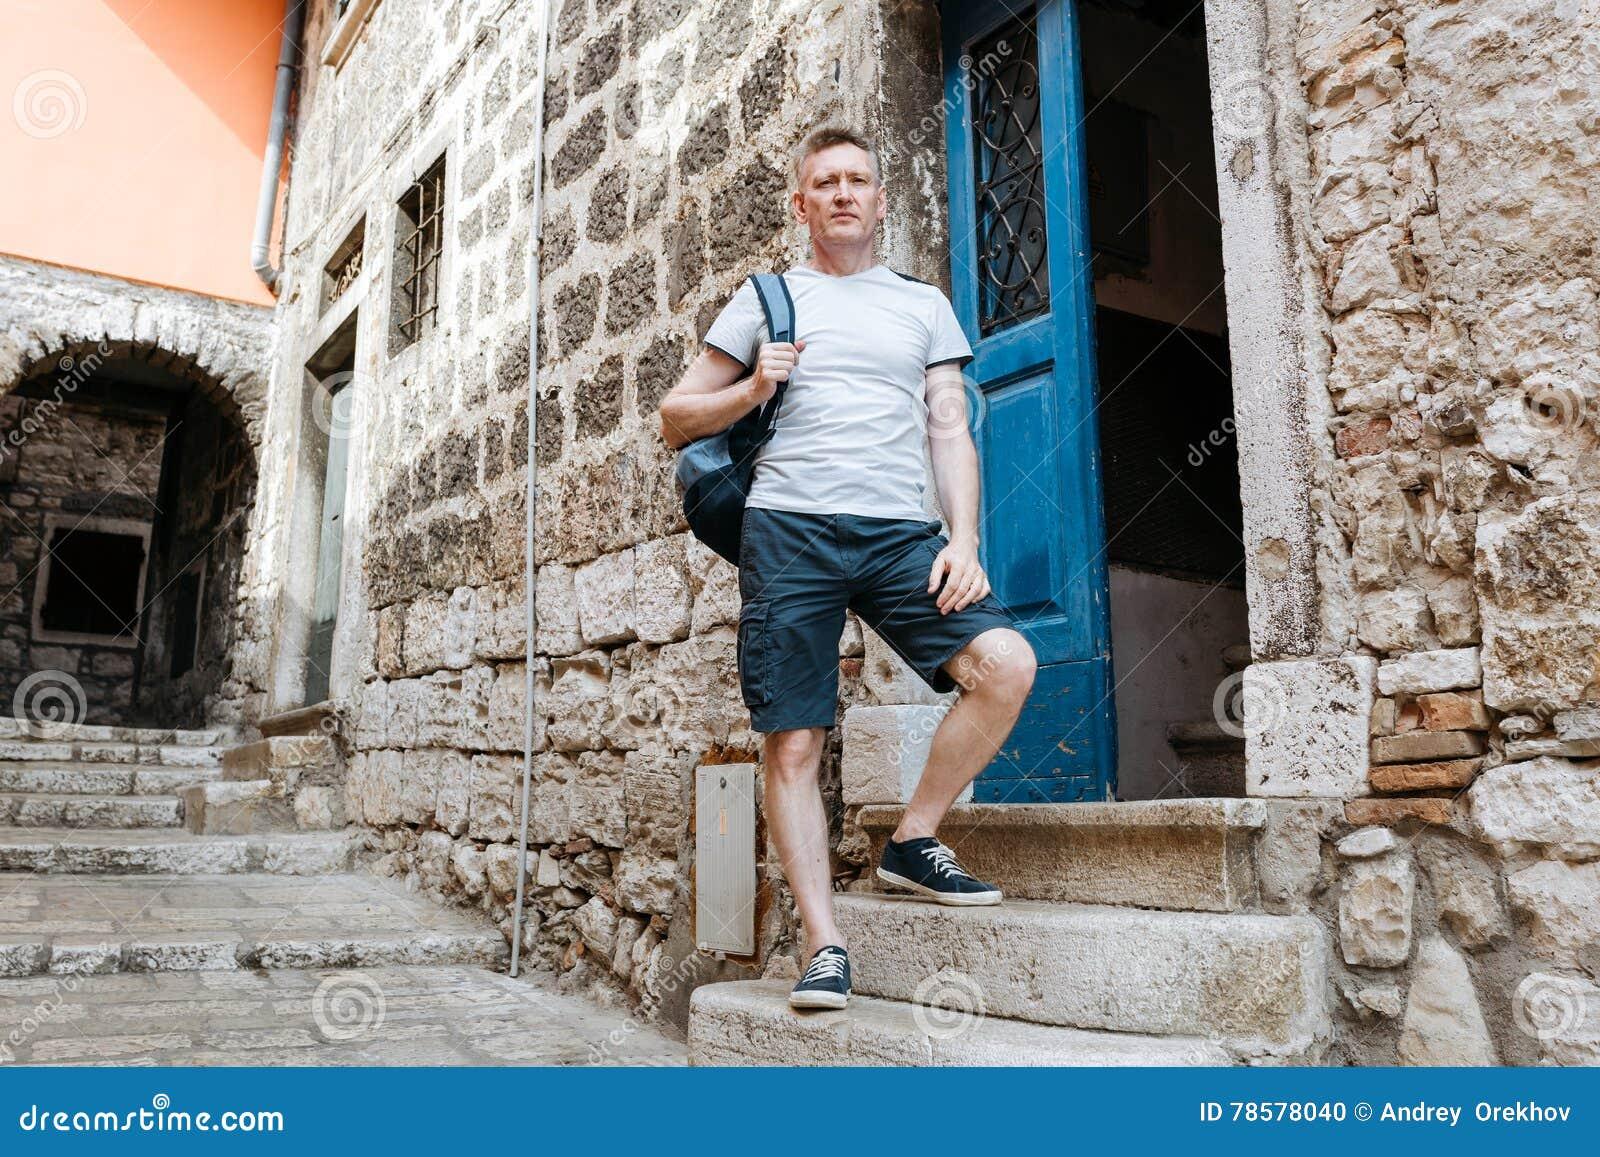 d358a816543b Το μοντέρνο άτομο τουριστών έντυσε σε ένα άσπρο πουκάμισο και μπλε σορτς με  ένα μπλε σακίδιο πλάτης πέρα από τον ώμο του Στάση στα βήματα μιας παλαιάς  ...